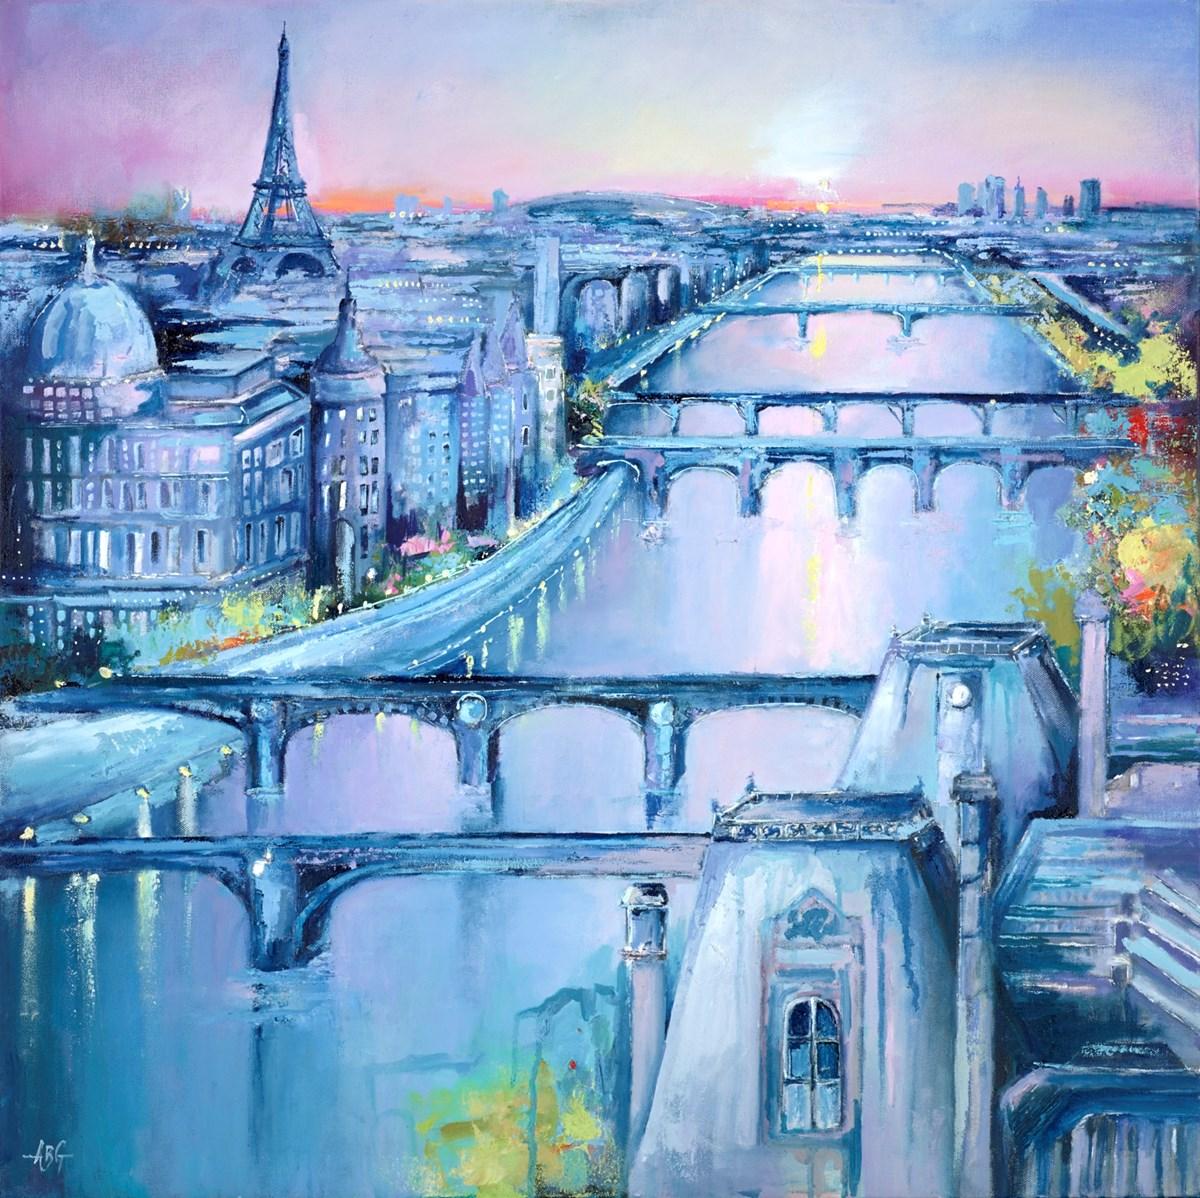 The Sights of Paris III